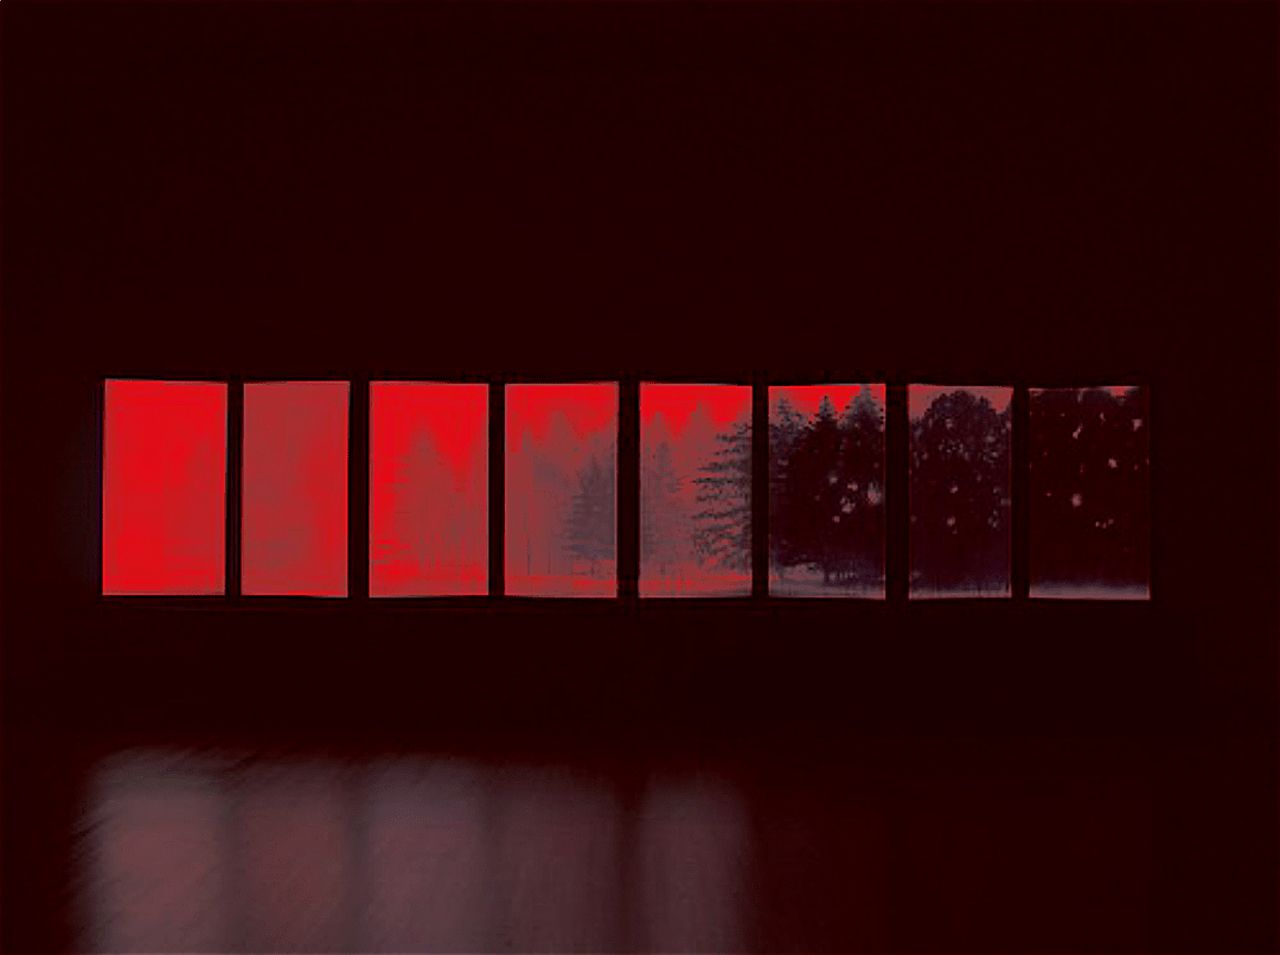 Red Aesthetic Red Aesthetic Macbook Wallpaper Red Wallpaper